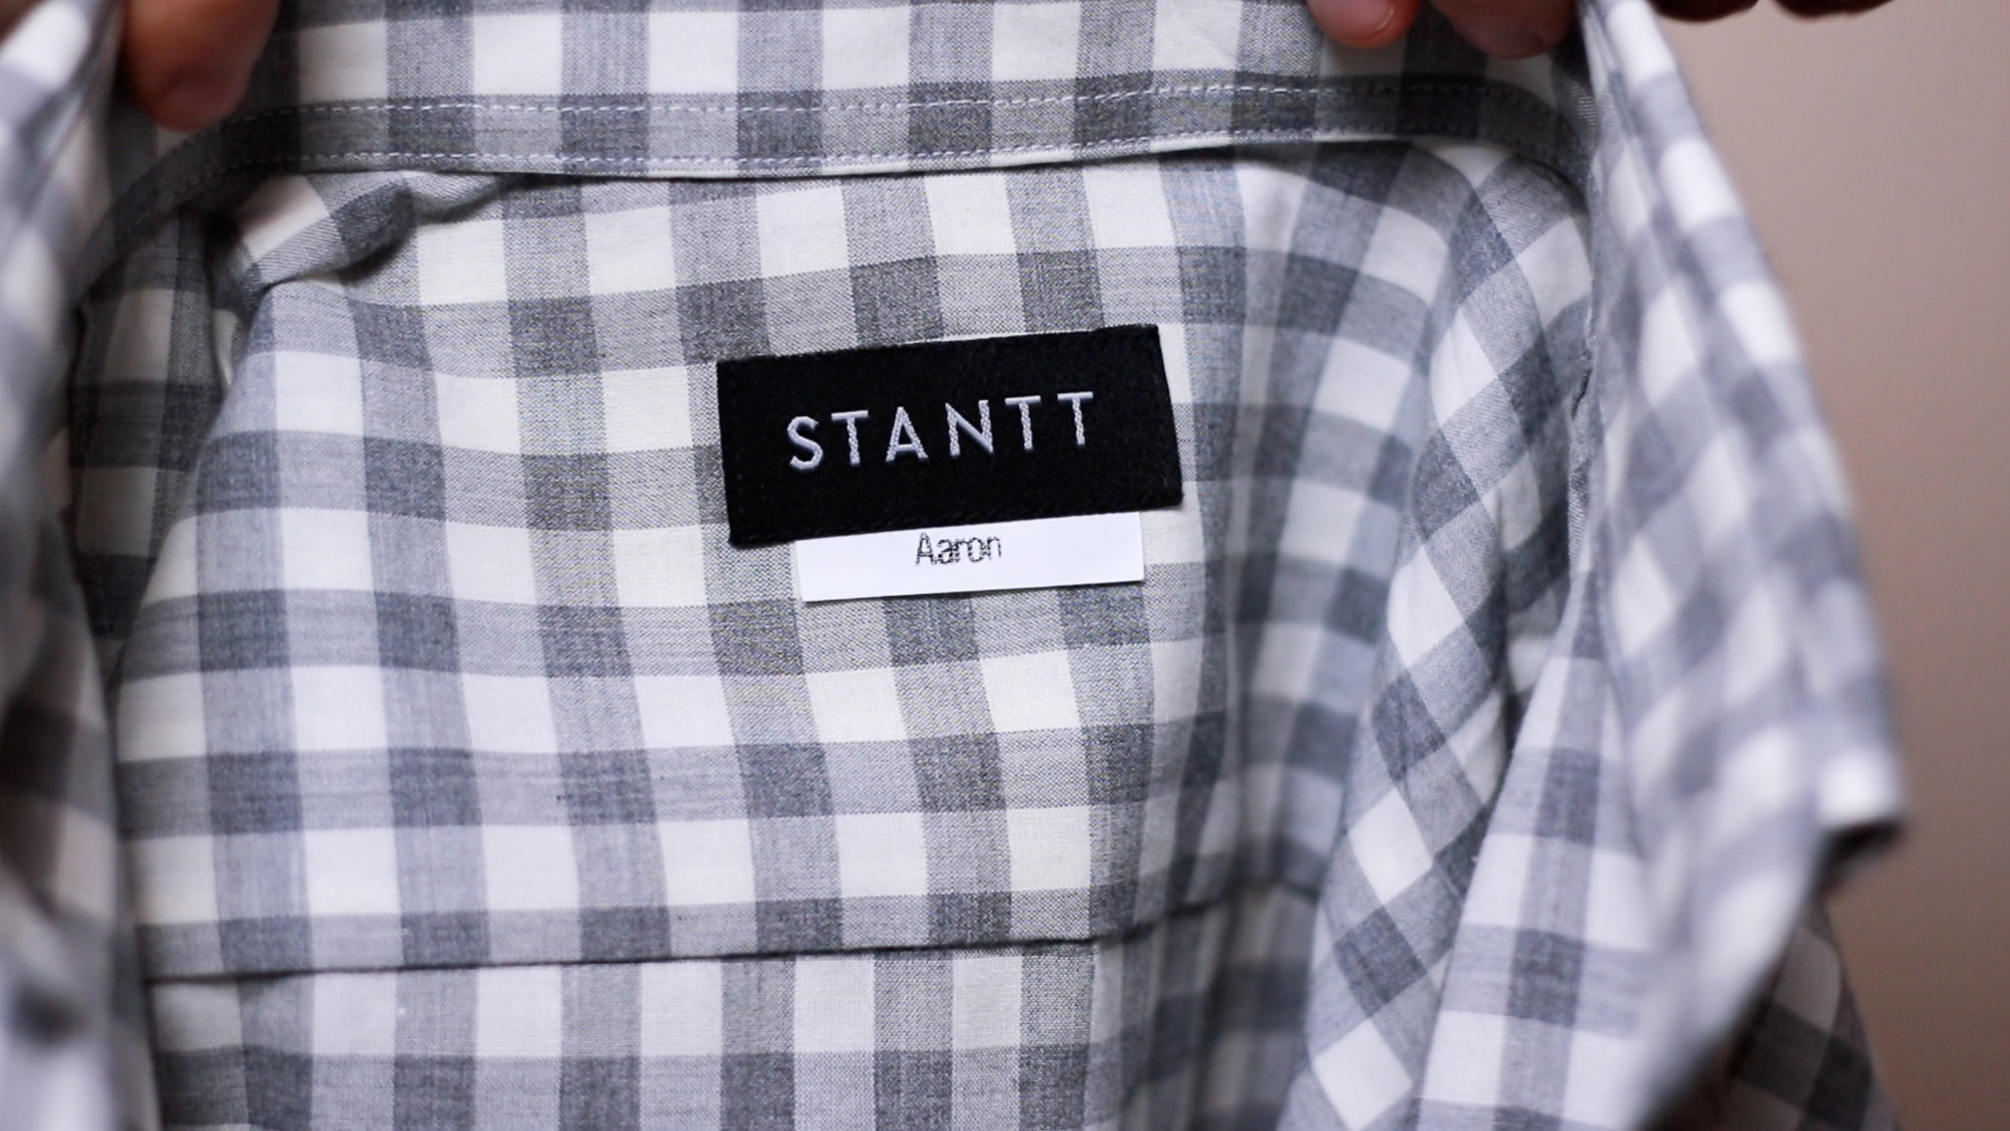 Stantt shirt label